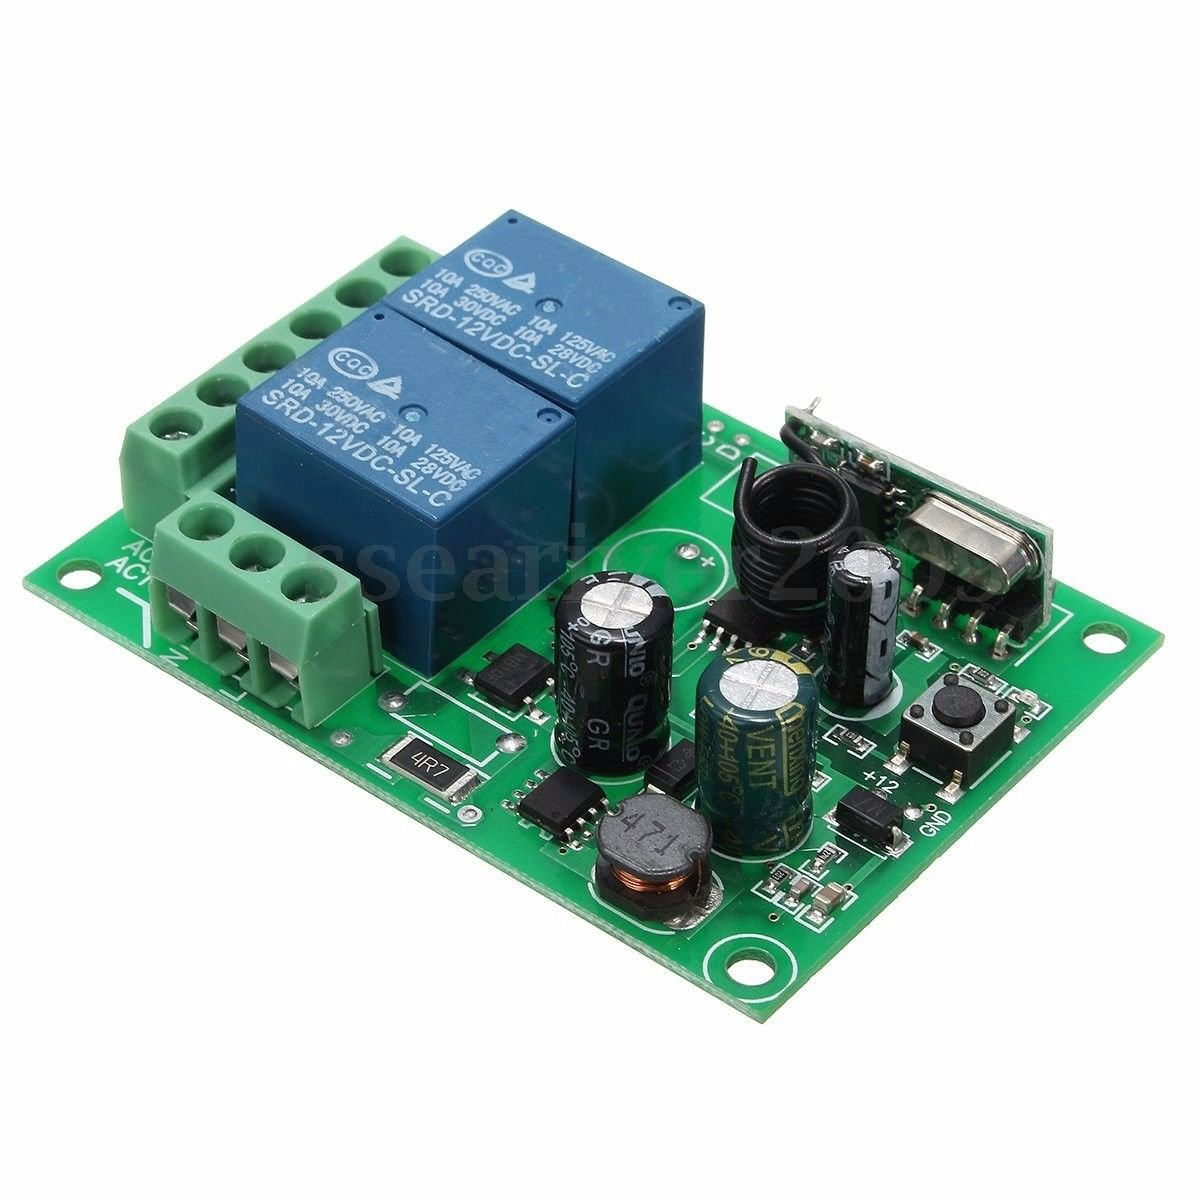 2CHANNEL 433 MHZ Channel Wireless RF Relay Remote Control Switch Receiver 10A 220V bdd